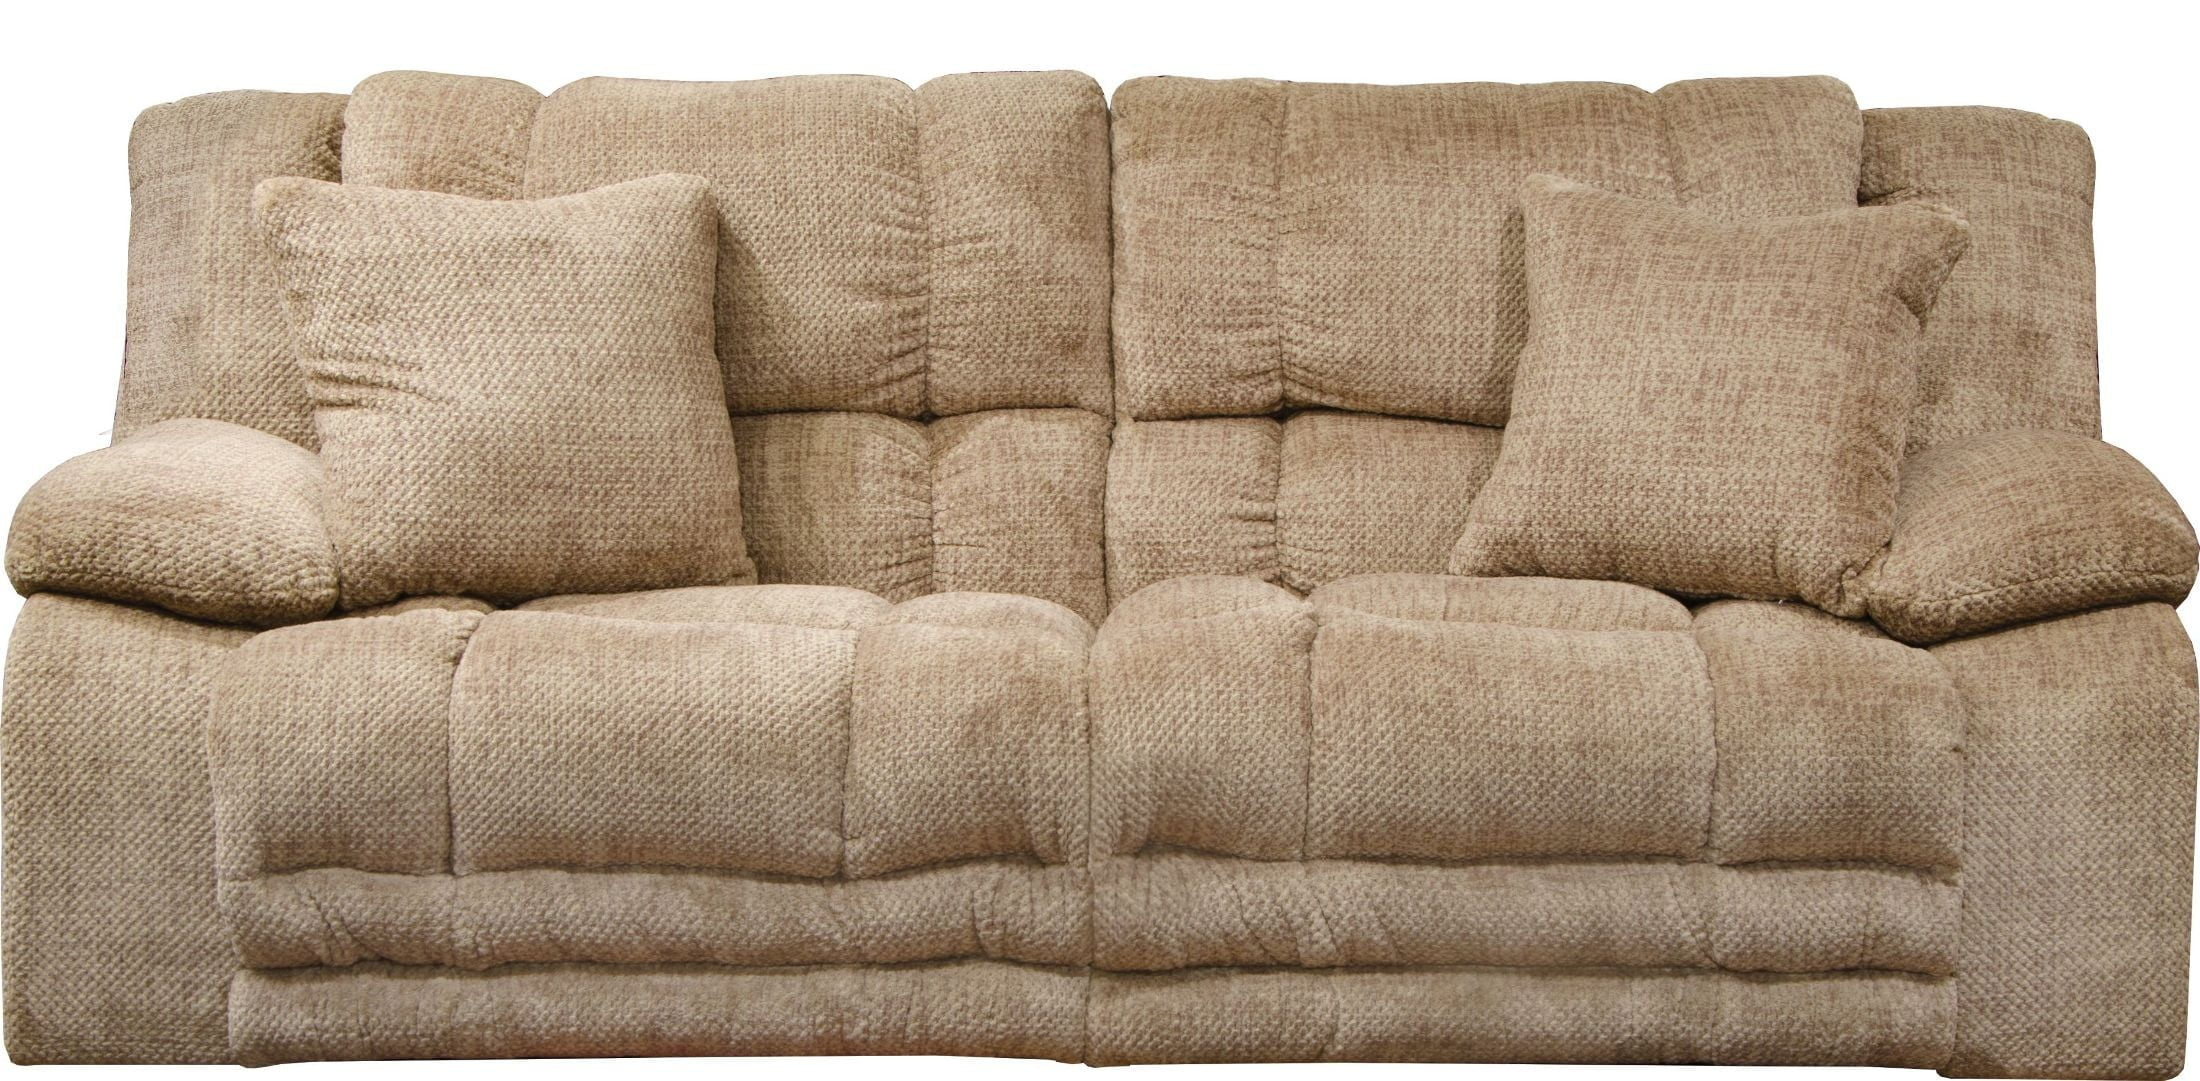 Branson Camel Lay Flat Power Reclining Sofa From Catnapper